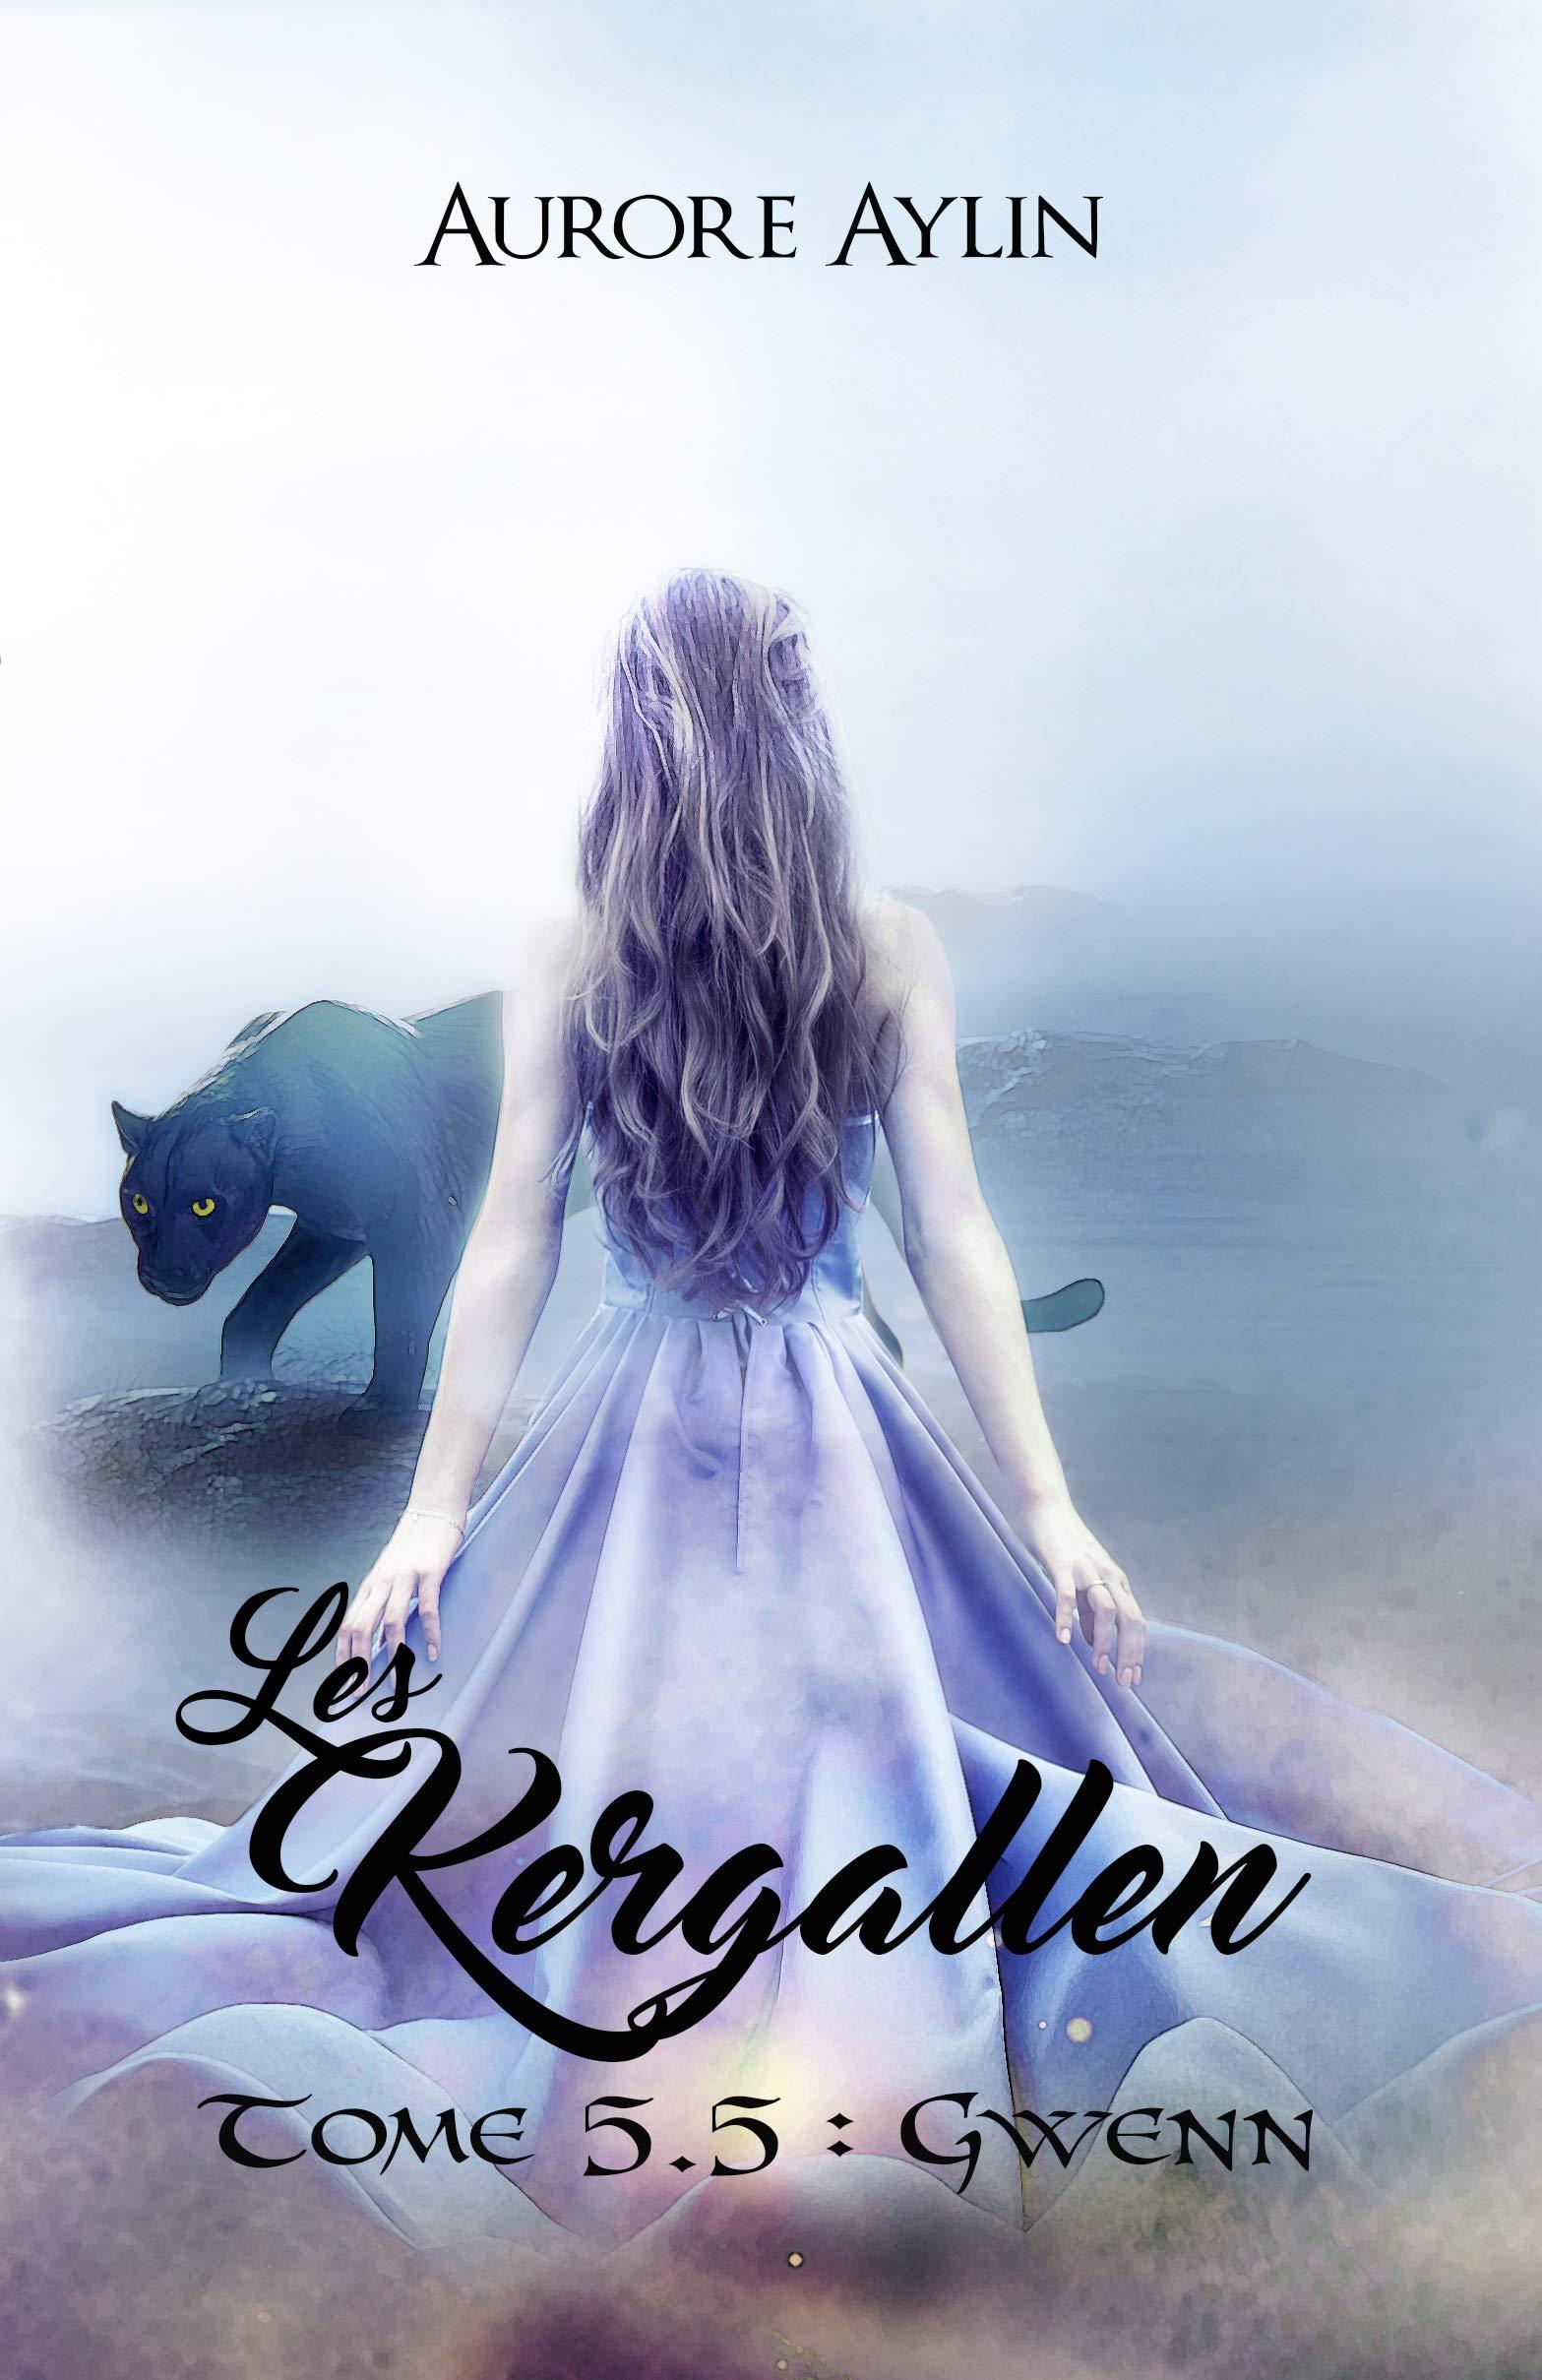 Les Kergallen, tome 5,5: Gwenn por Aurore Aylin